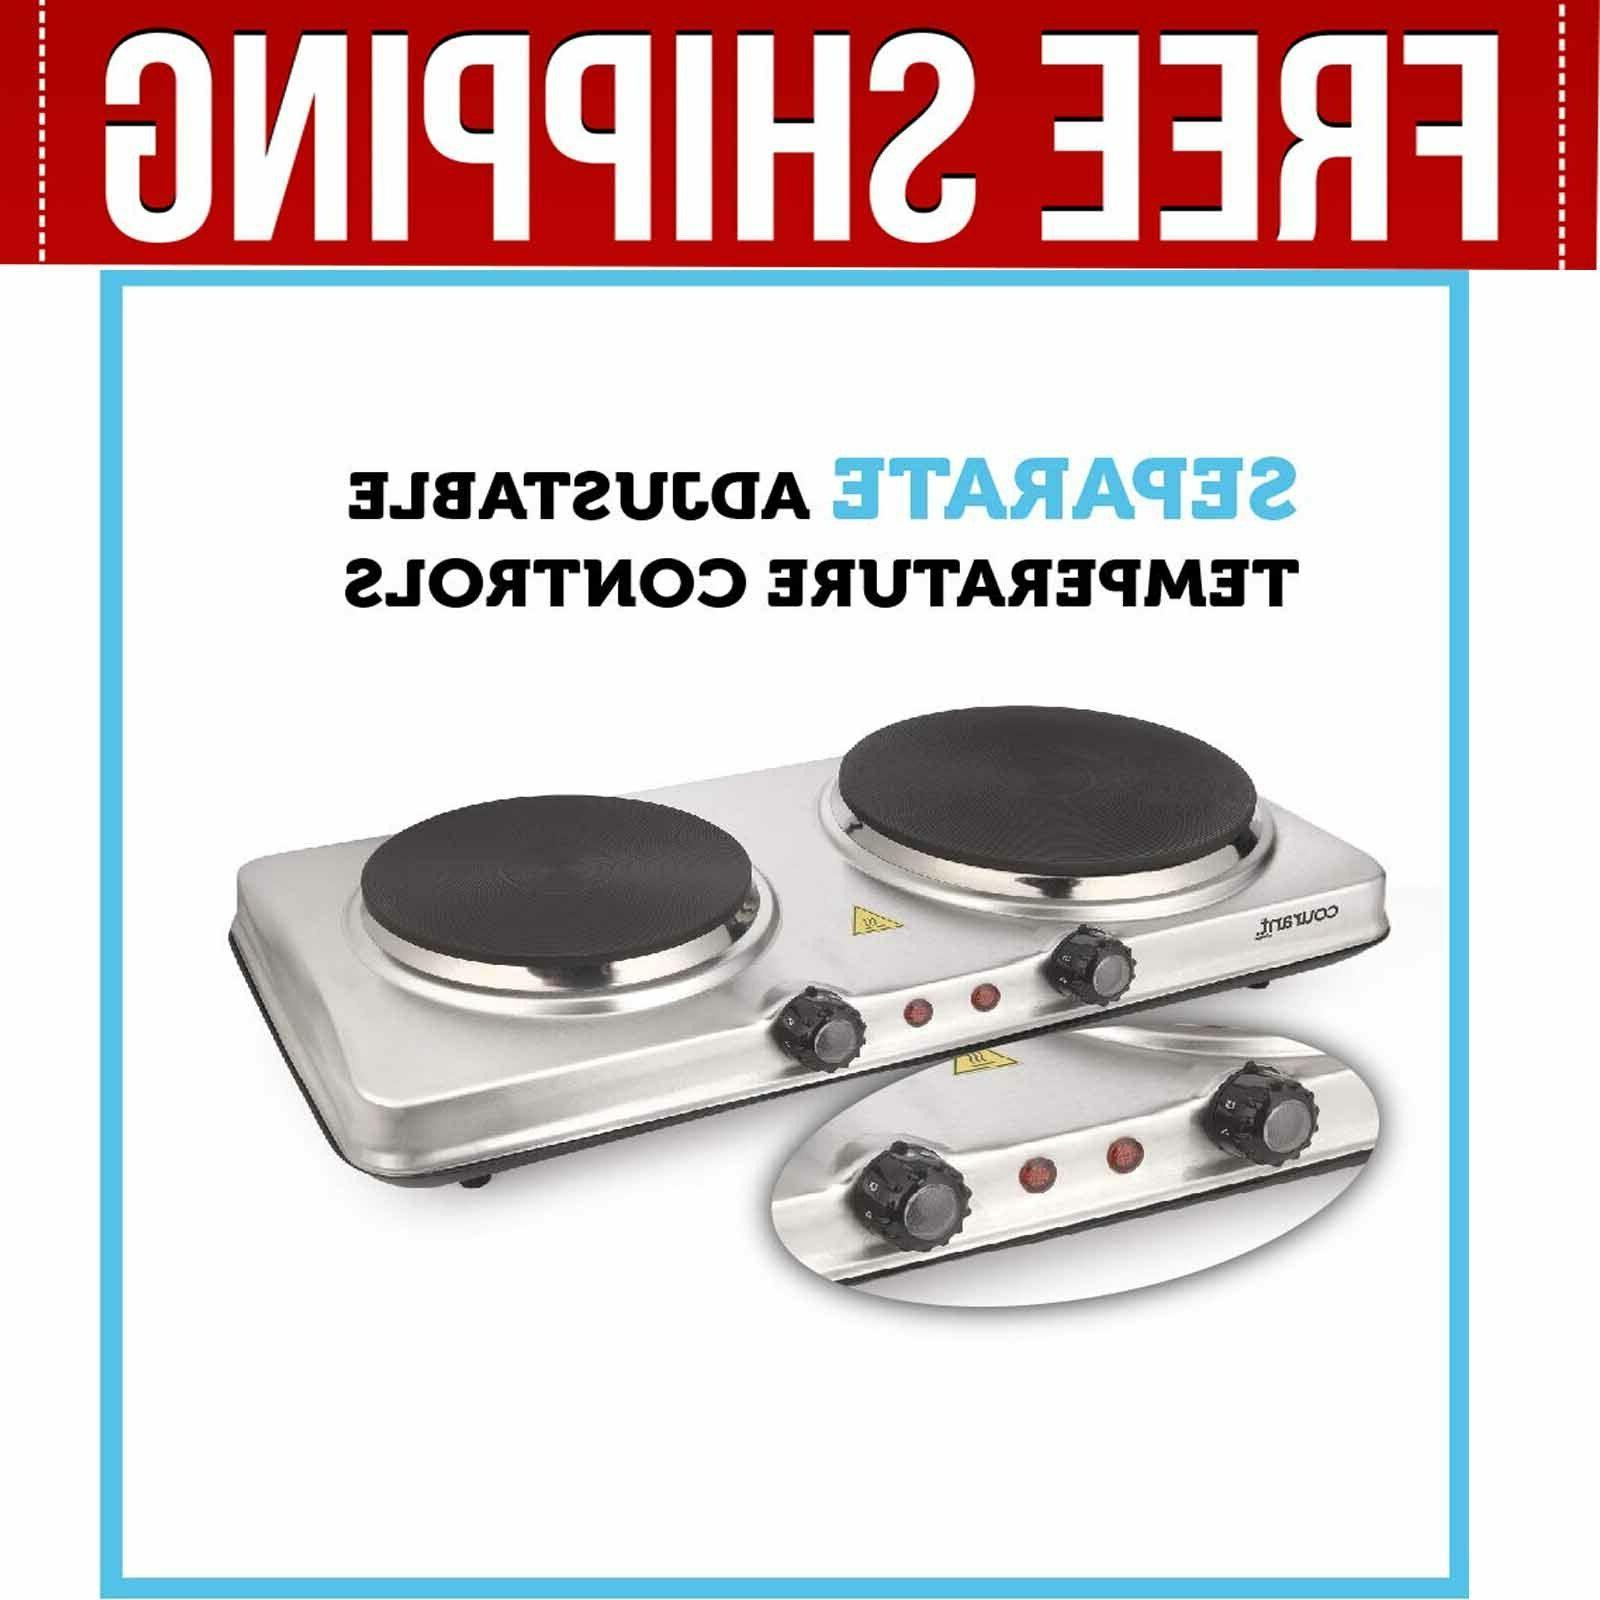 Electric Cooktop Burner 1700W Hot Portable Burners